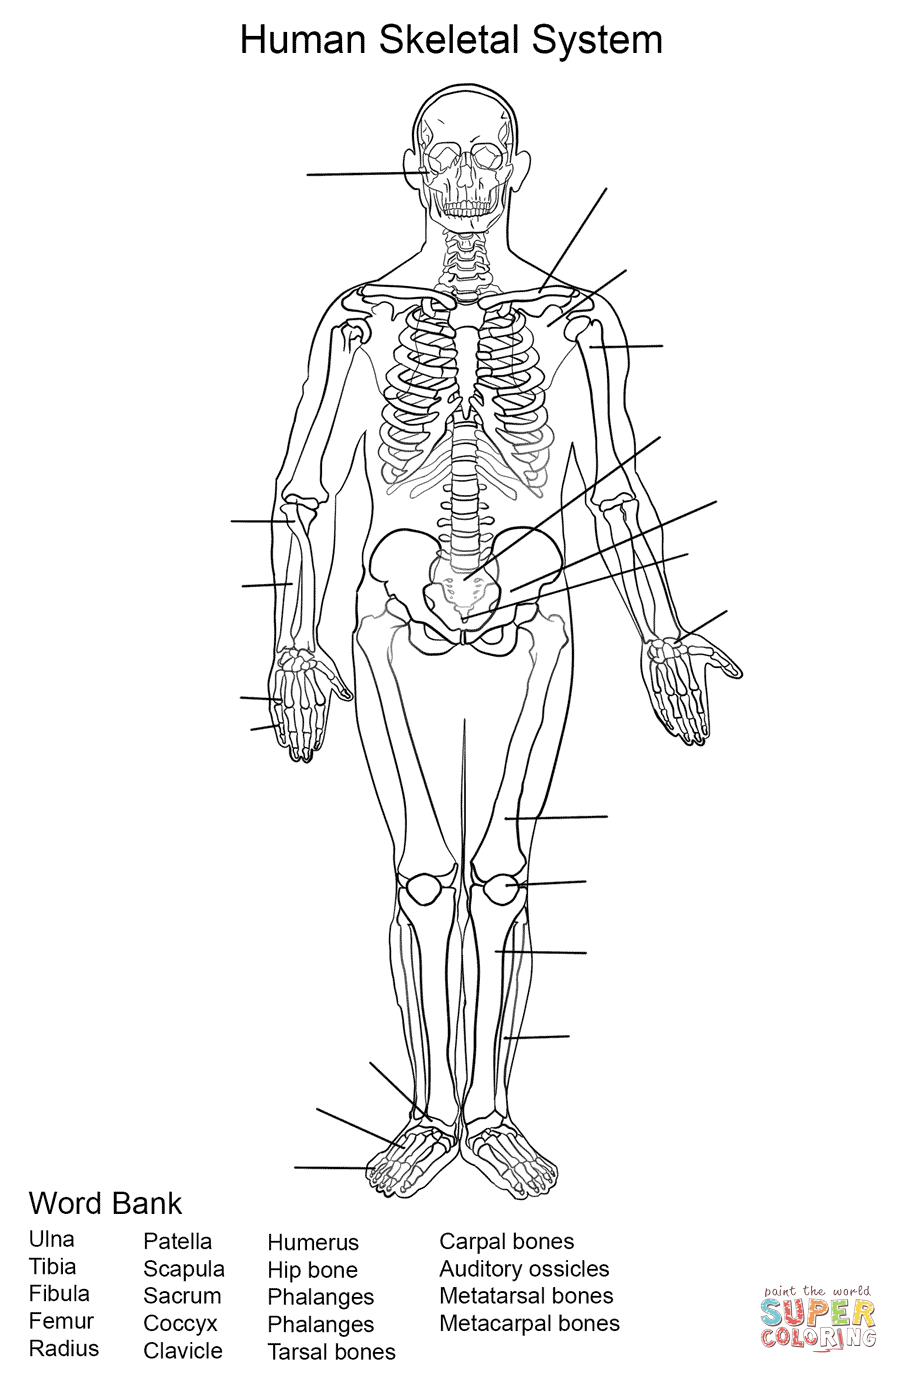 Human Skeletal System Worksheet Coloring Page | Free Printable | Human Skeleton Printable Worksheet